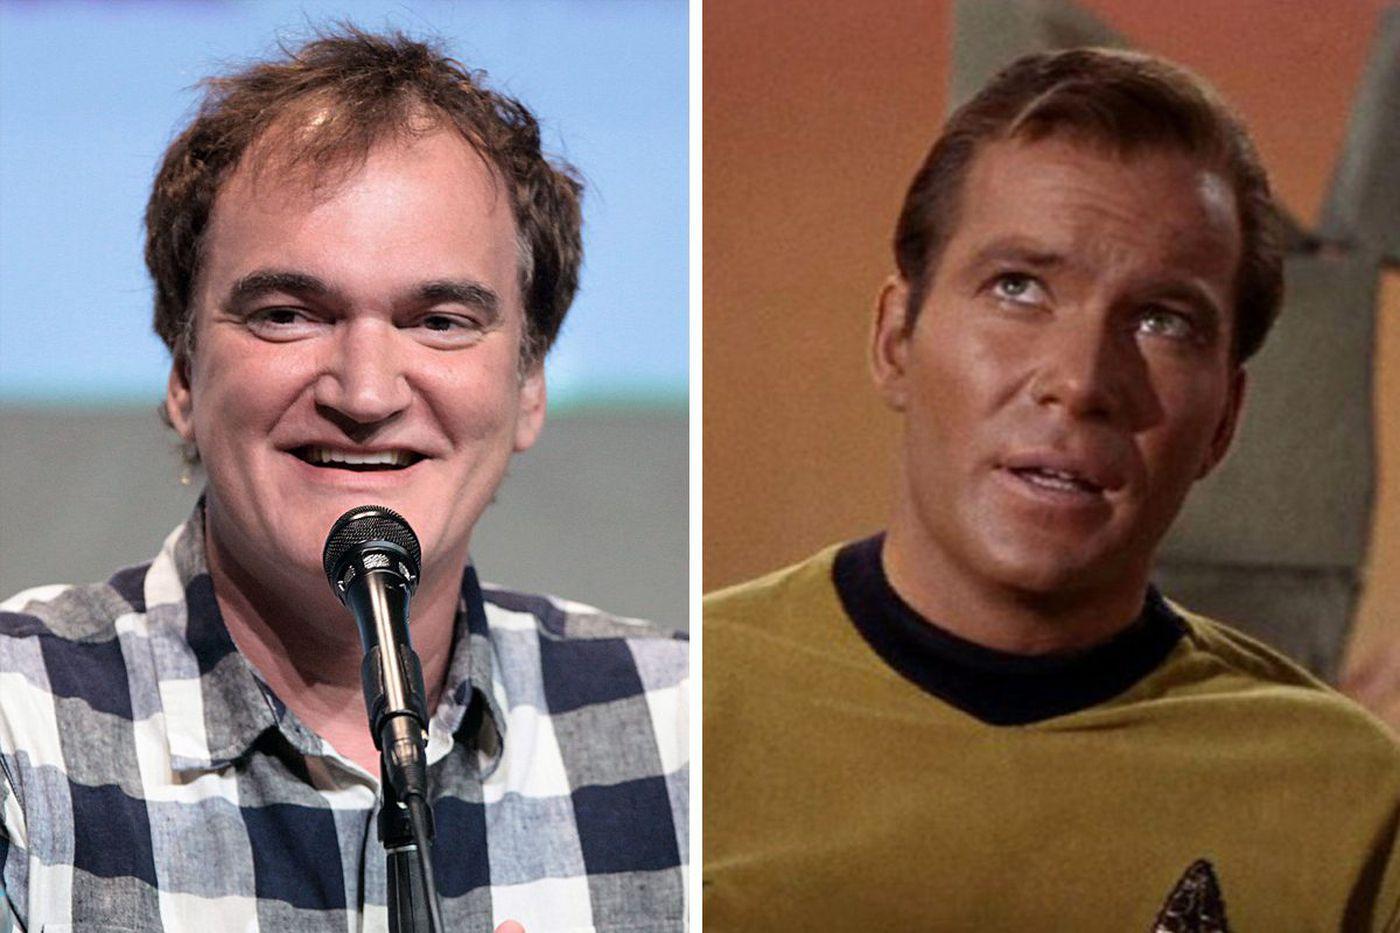 'Kill Bill' director Quentin Tarantino could direct the next 'Star Trek' movie